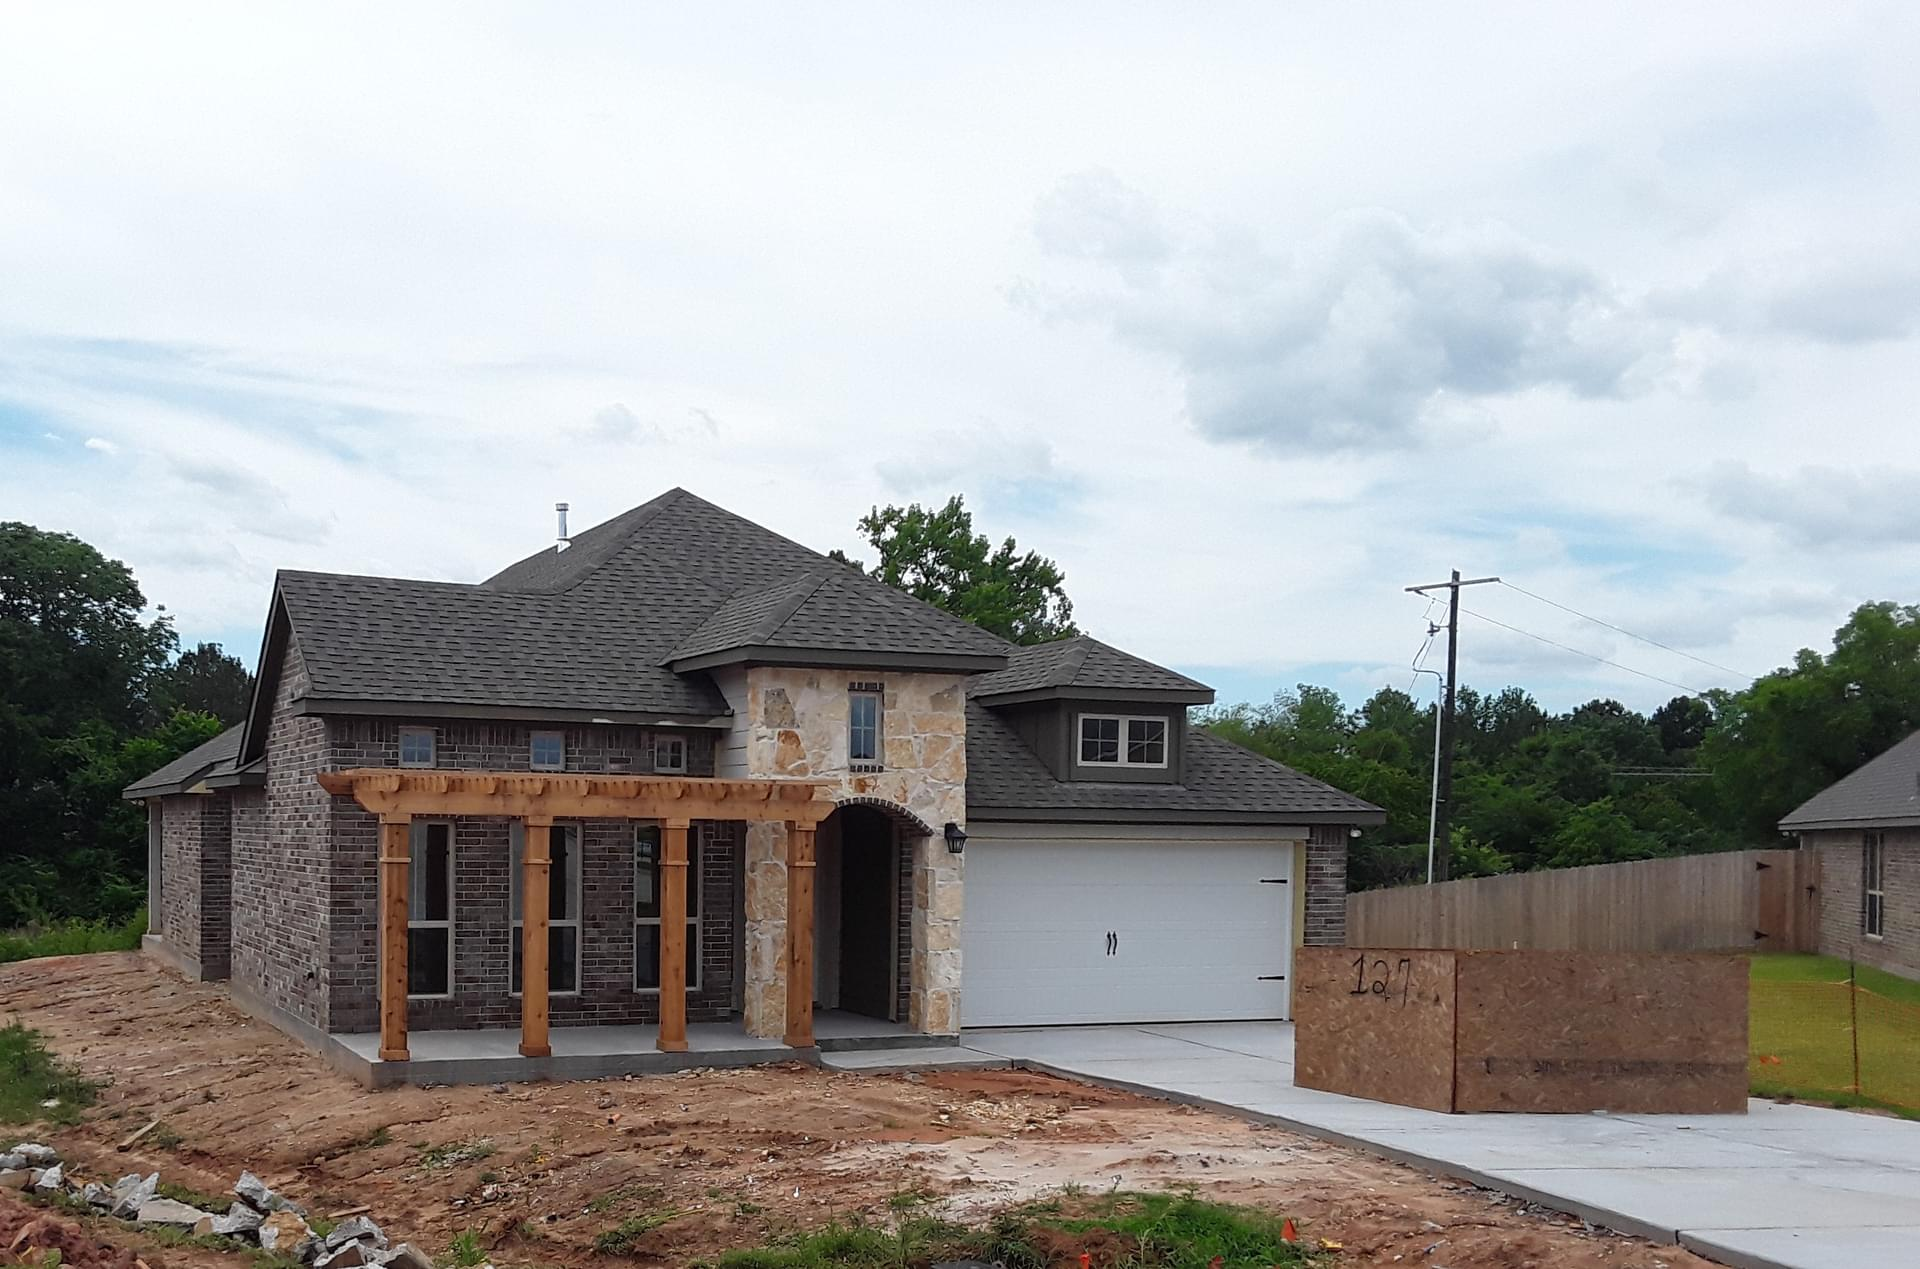 127 Abner Lane in Montgomery, TX